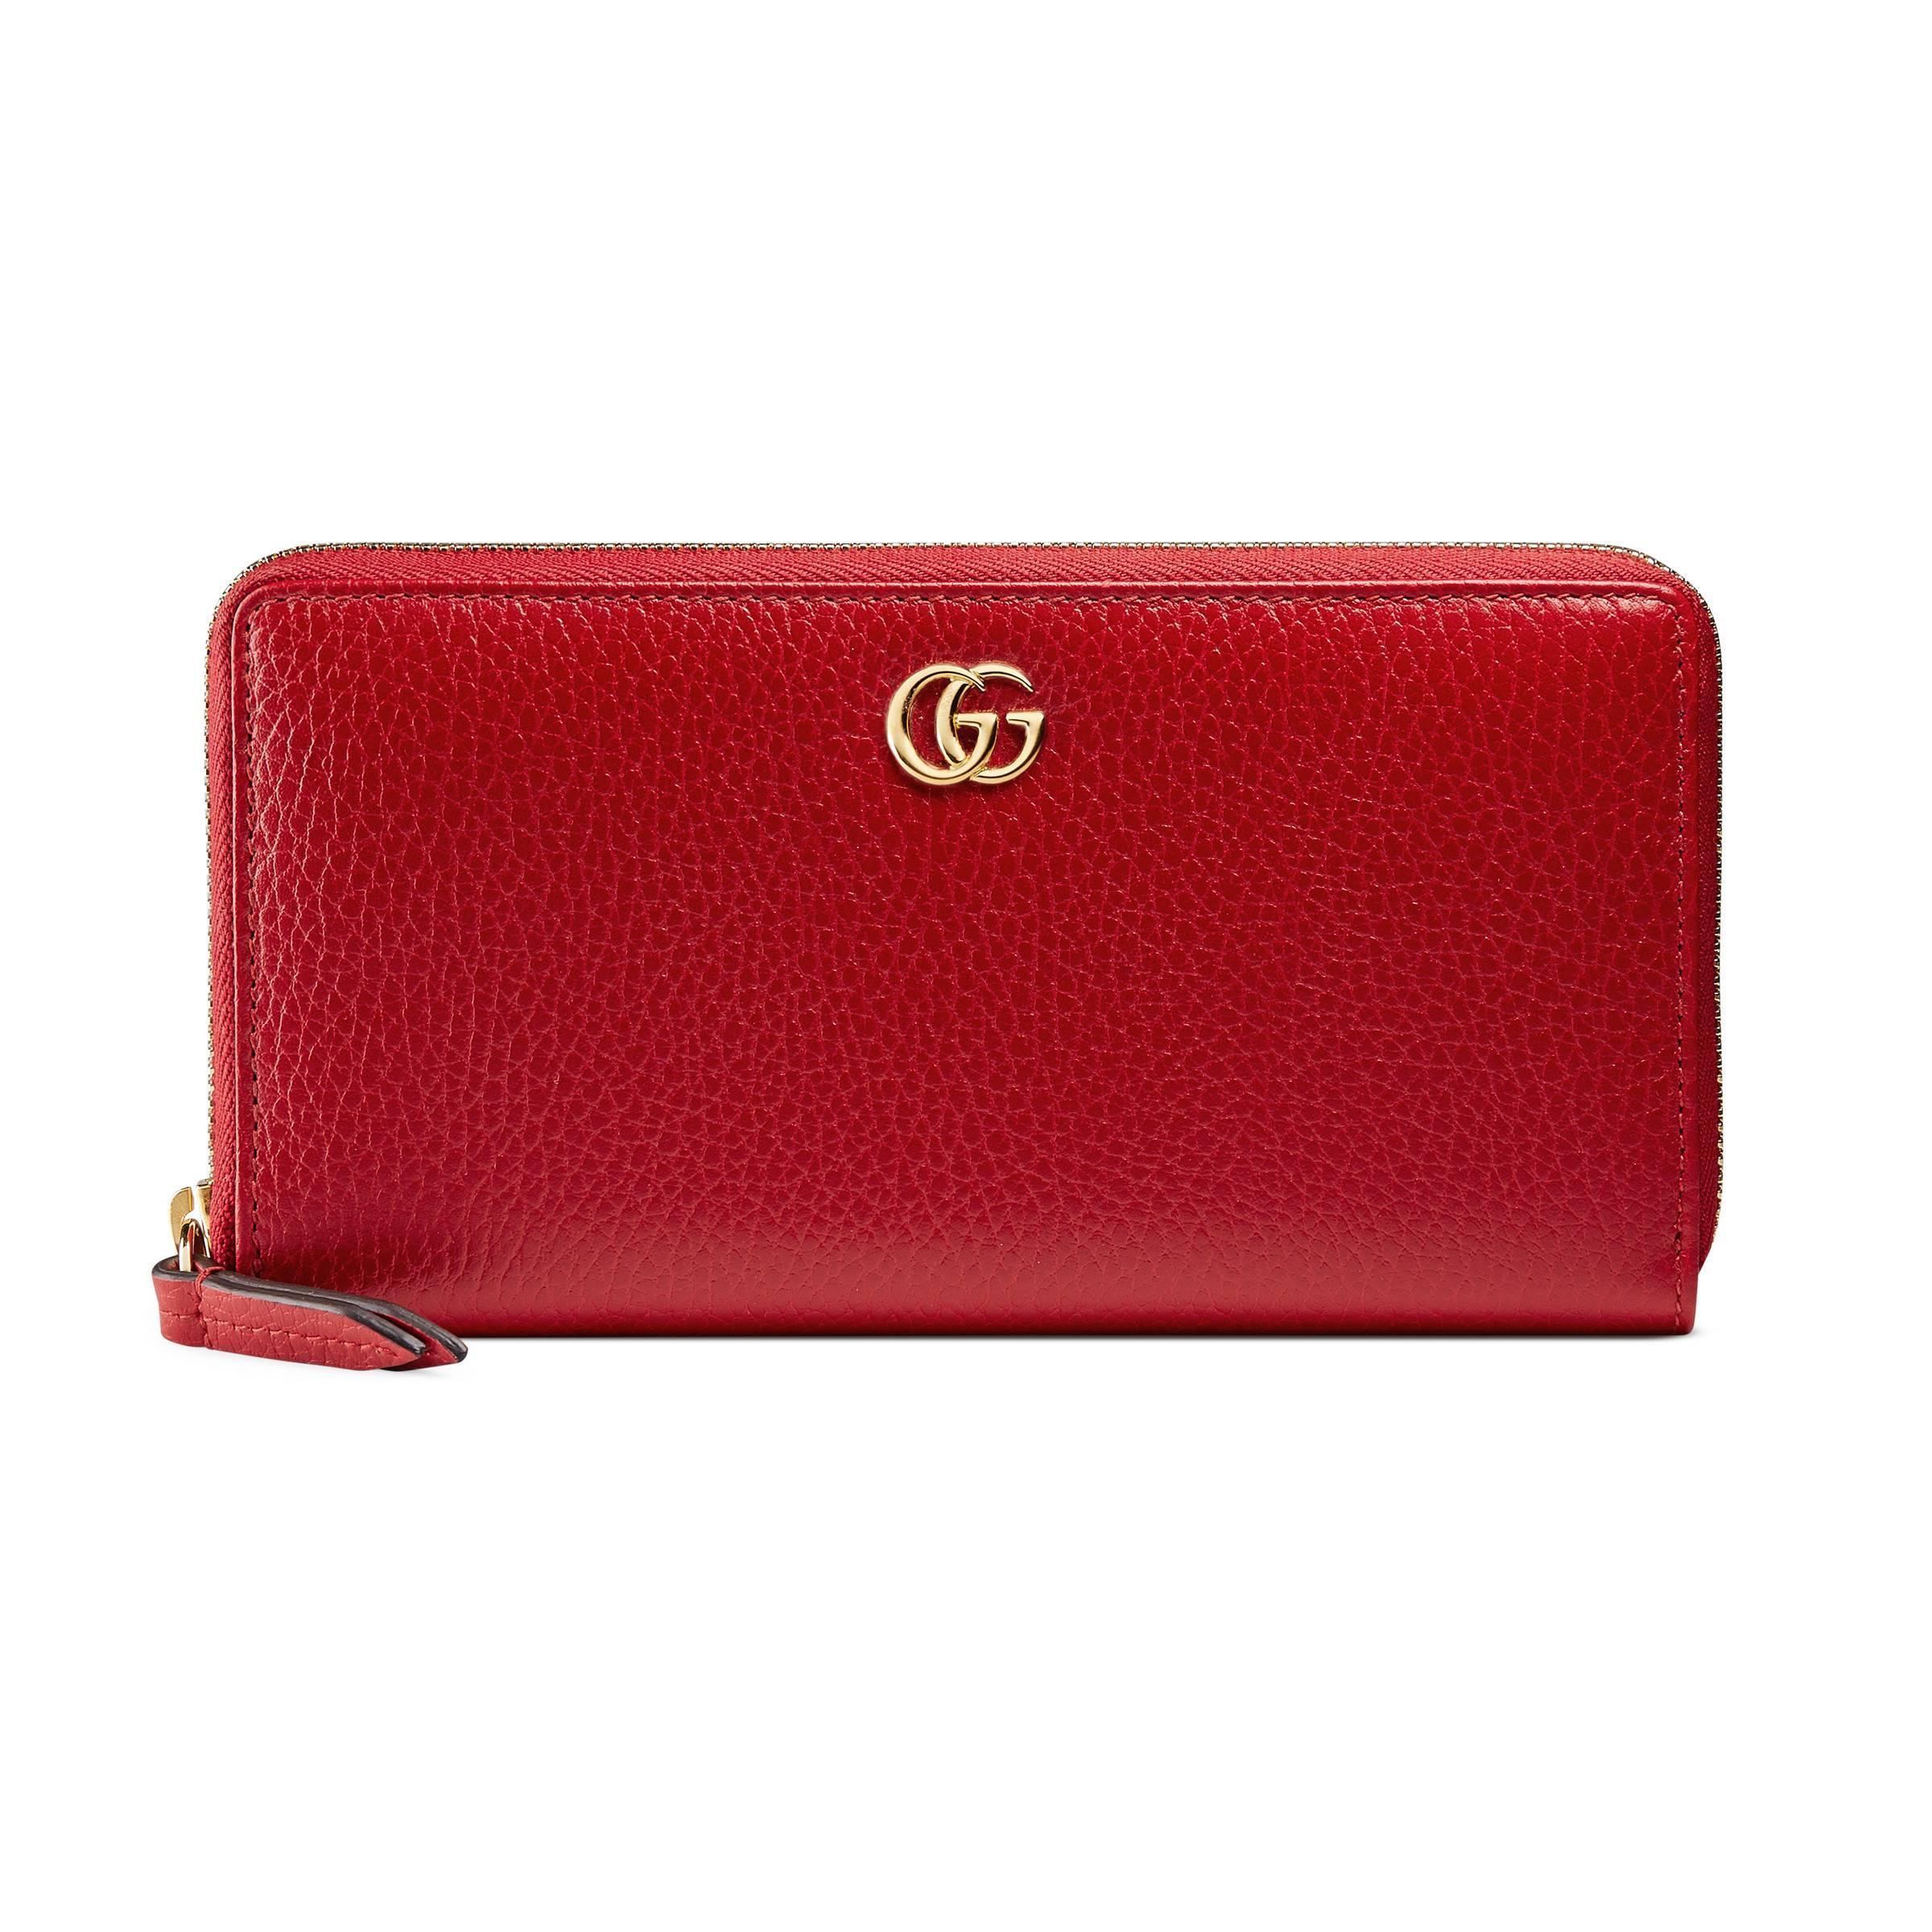 d68096dc0d02 Gucci Portafoglio in Red - Save 10% - Lyst